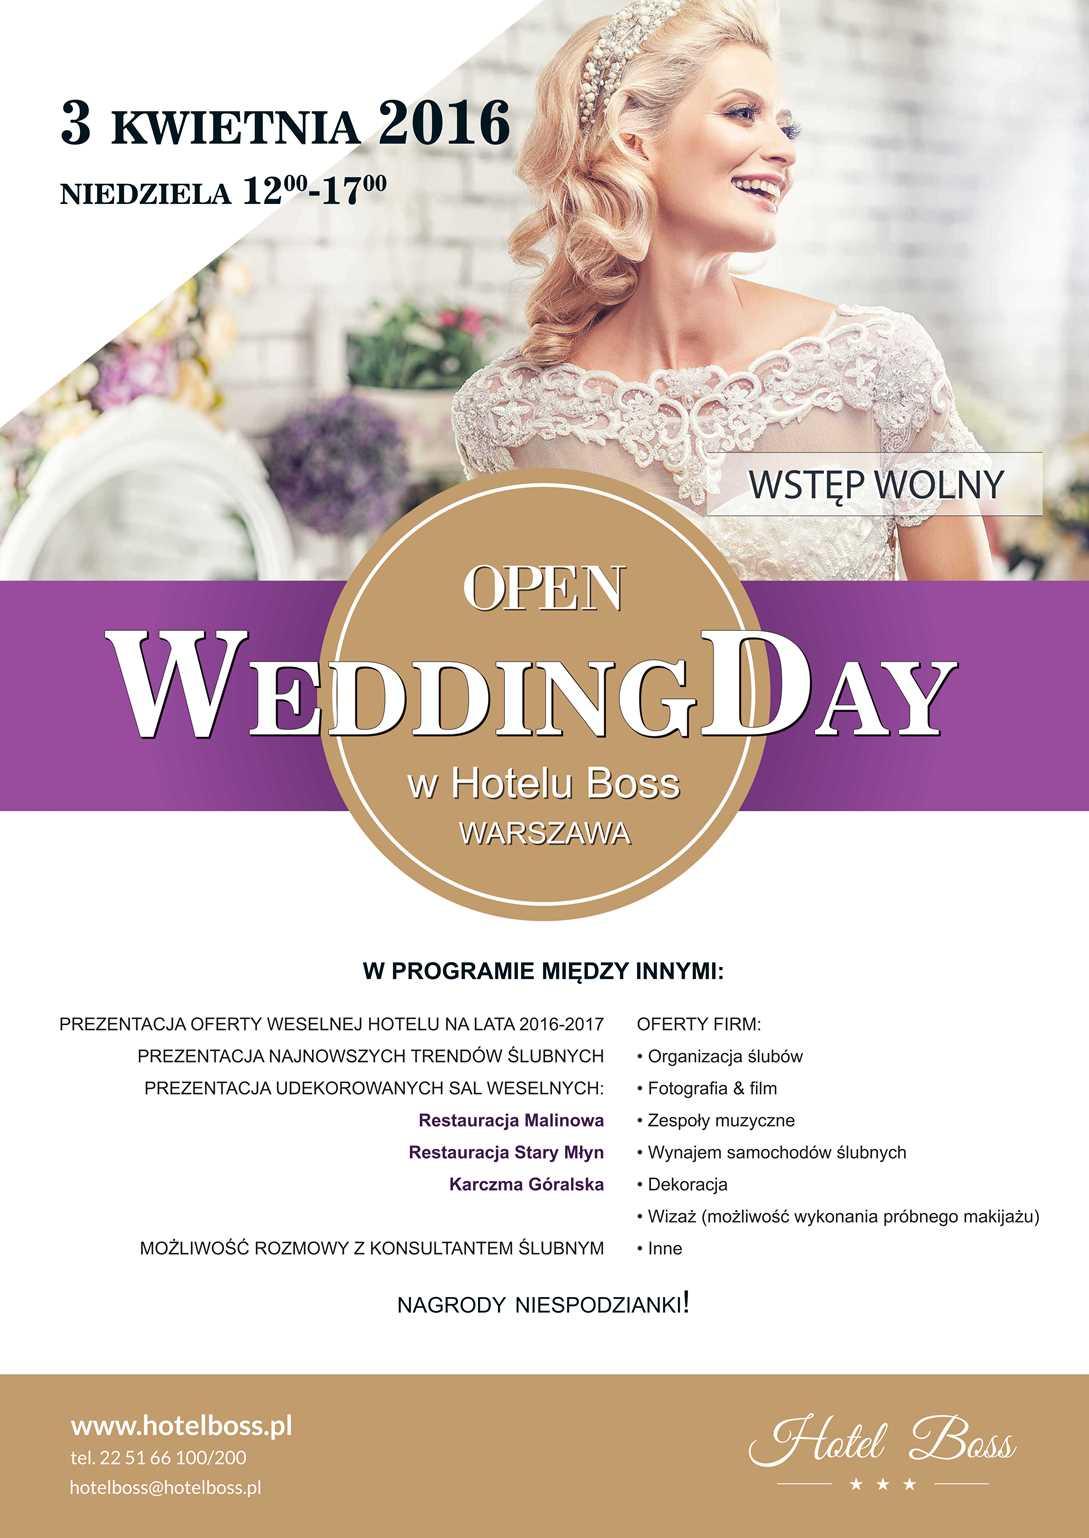 Open Wedding Day w Hotelu Boss 3 kwietnia 2016 r. Targi Ślubne